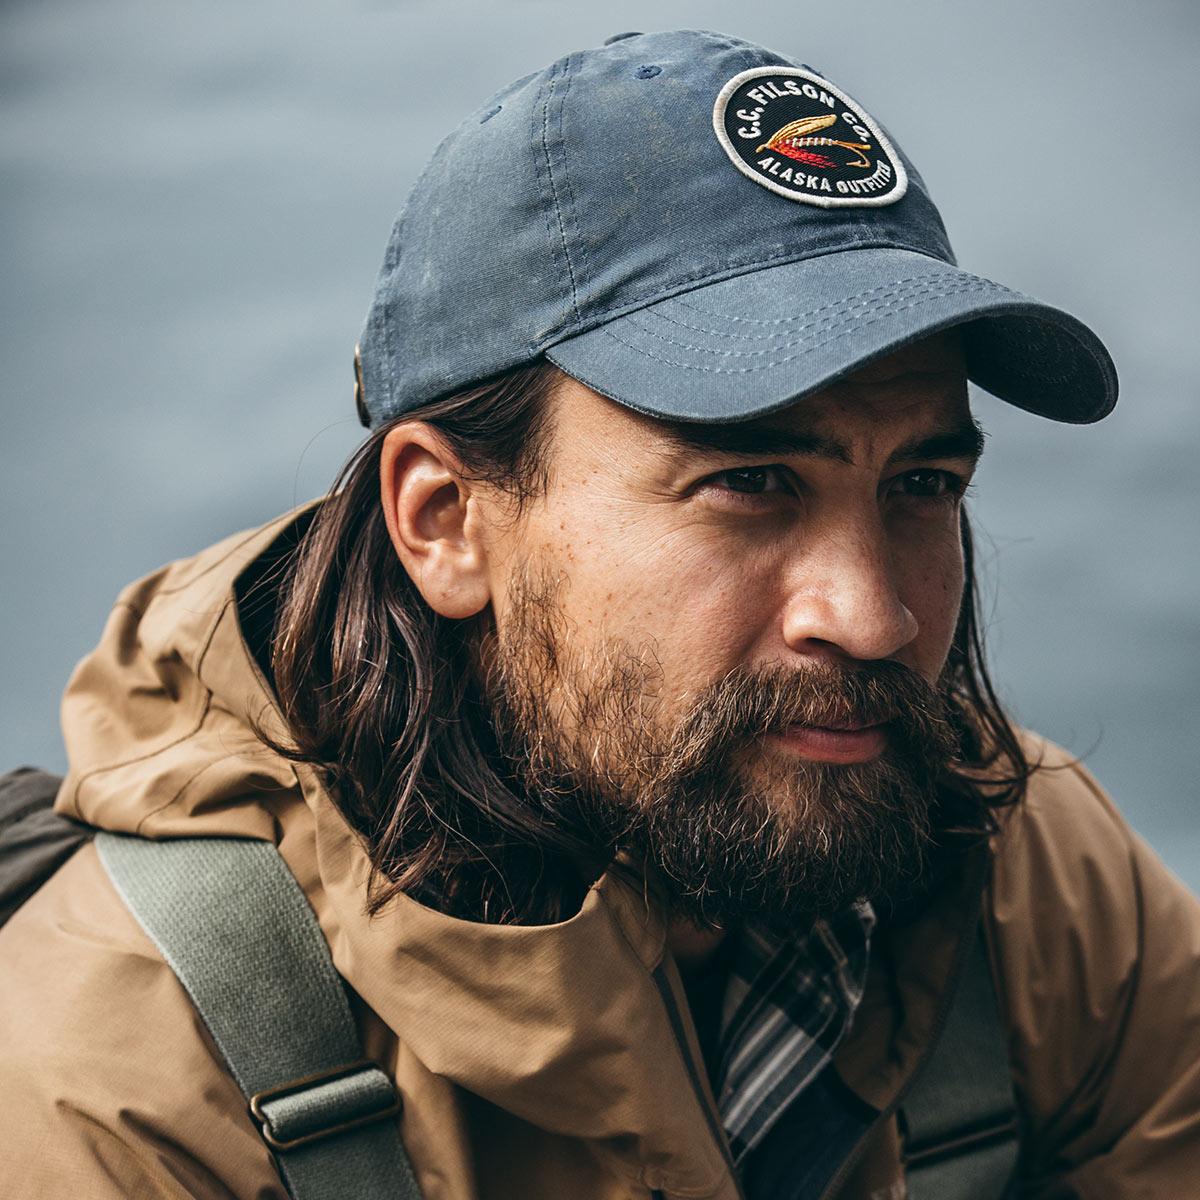 Filson Sail Cloth Low-Profile Cap Slate, cap met een laag, rond profiel